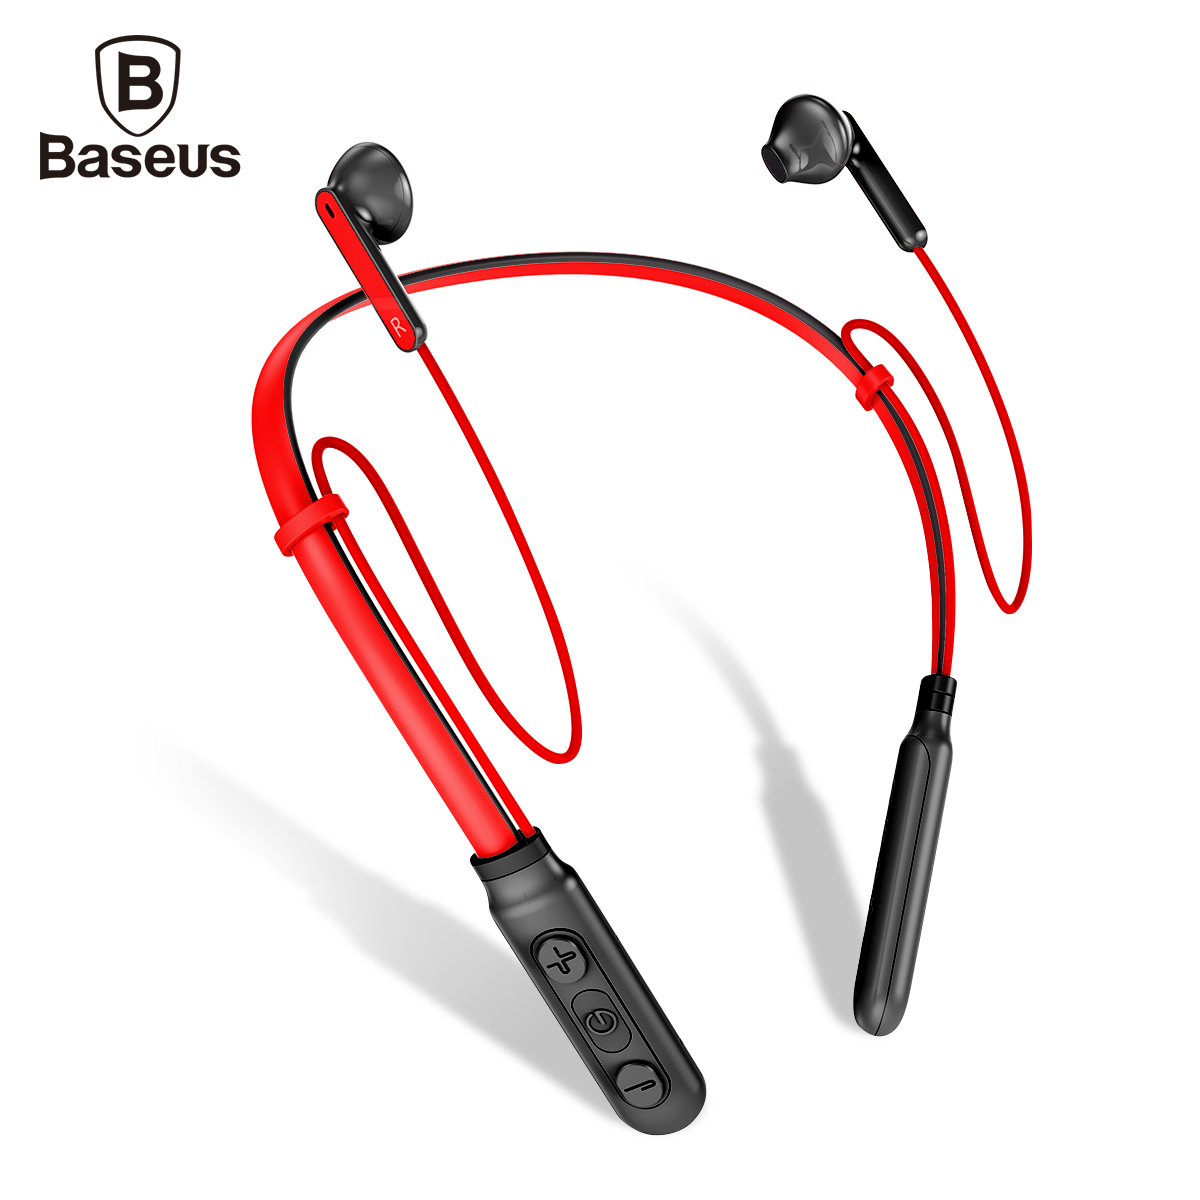 2017 Newest Baseus S16 Wireless Headphone Bluetooth Earphone Fone De Ouvido For Mobile Phone Neckband Ecounter Auriculares V4.0